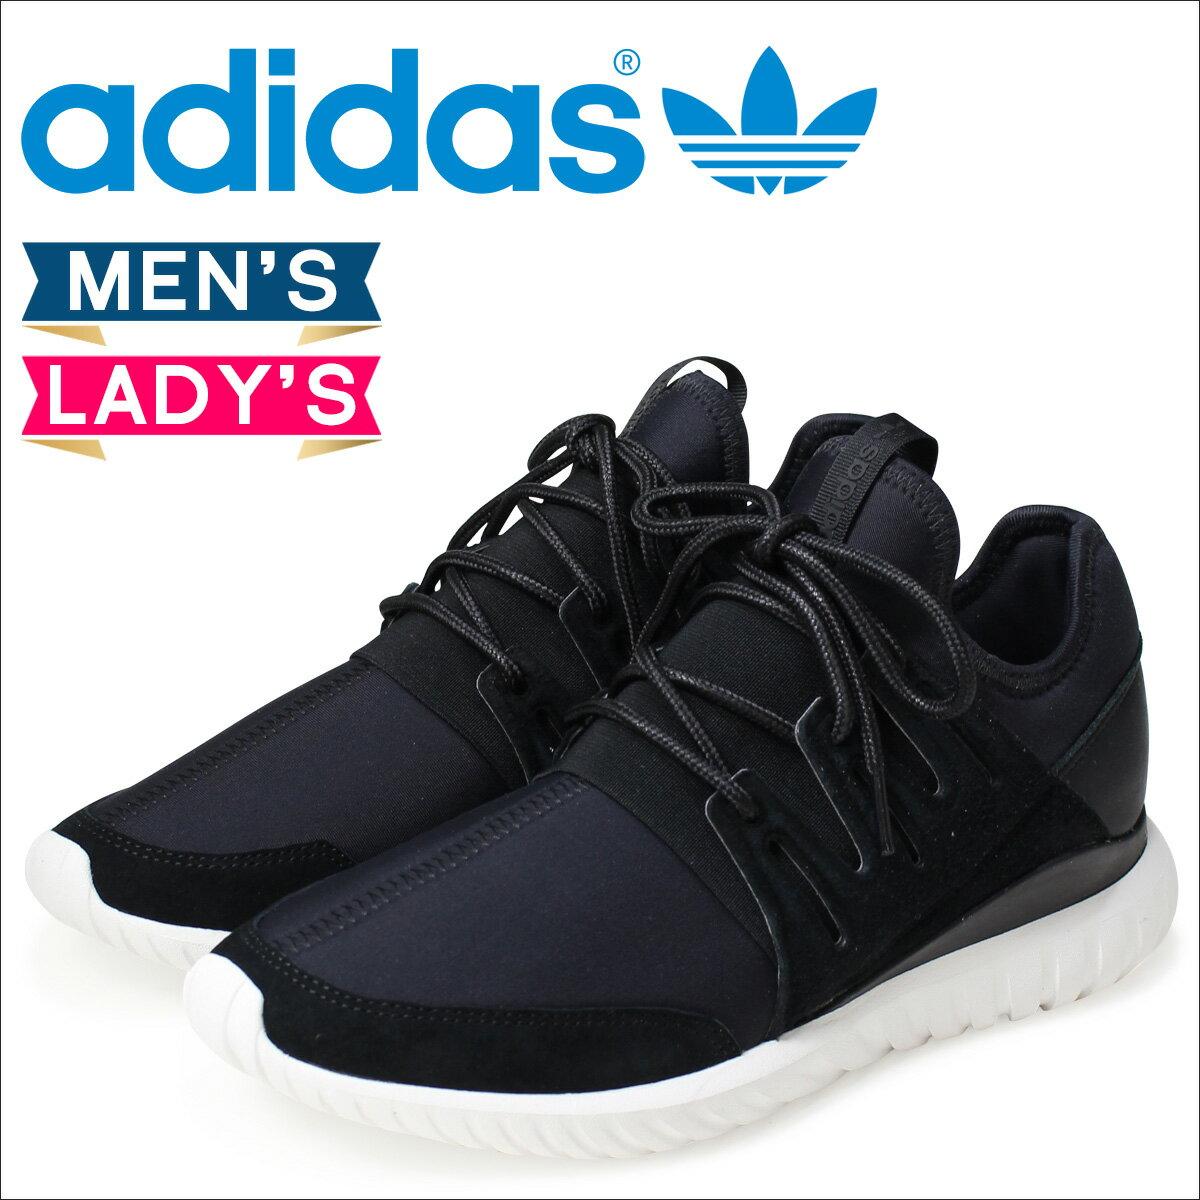 adidas Originals チュブラー メンズ レディース スニーカー アディダス オリジナルス ラディアル  TUBULAR RADIAL  AQ6723 靴 ブラック